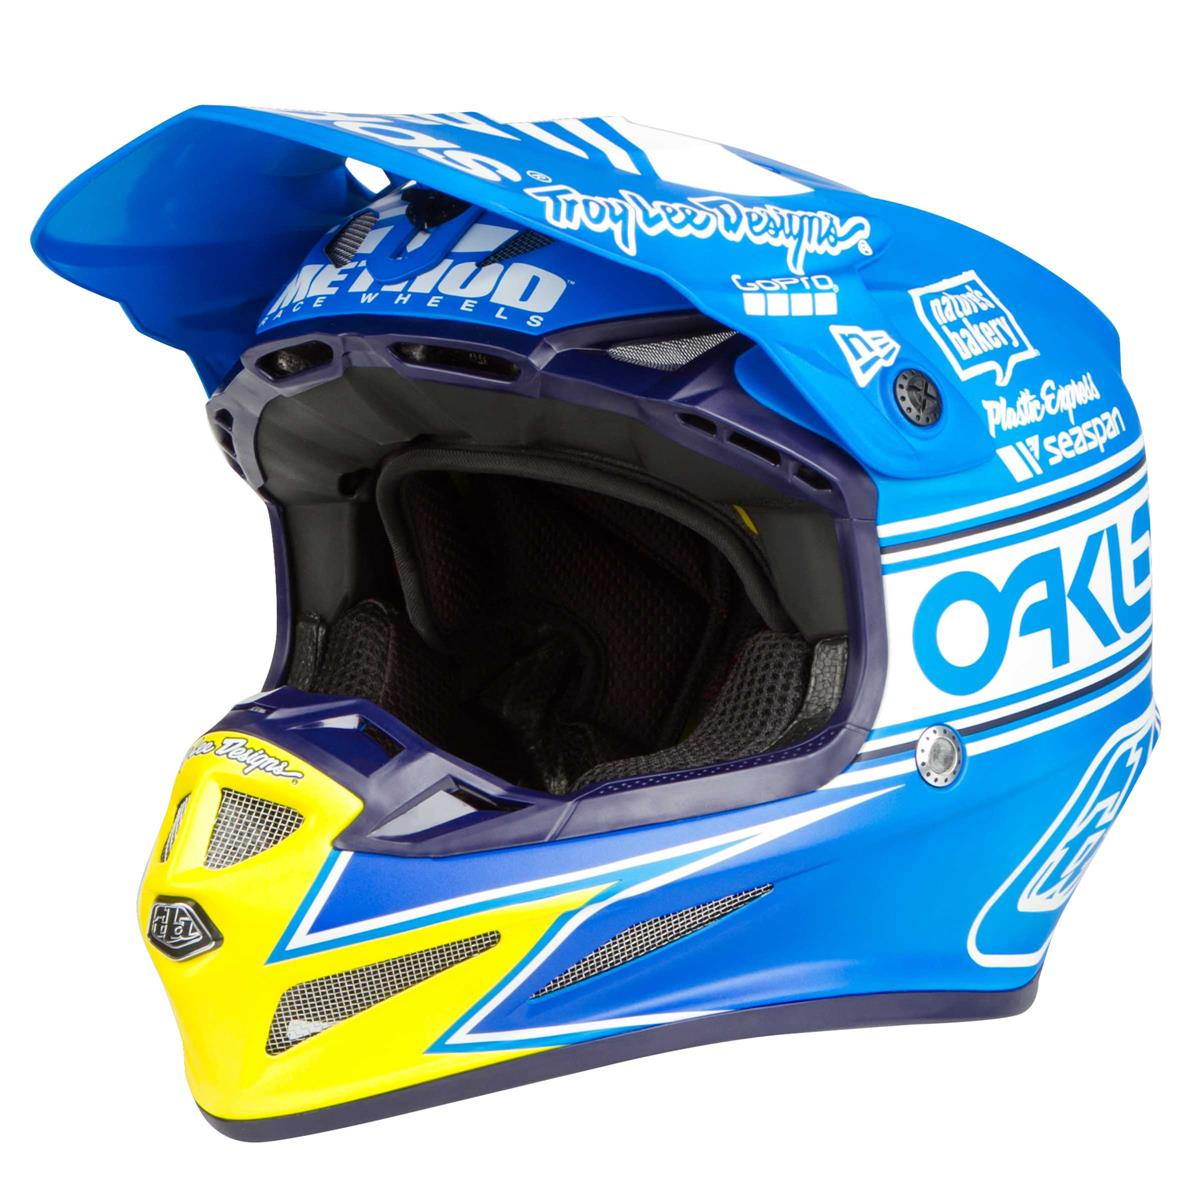 Troy Lee Designs Helmet SE4 Composite ULTRA Limited Edition Adidas Team Ocean